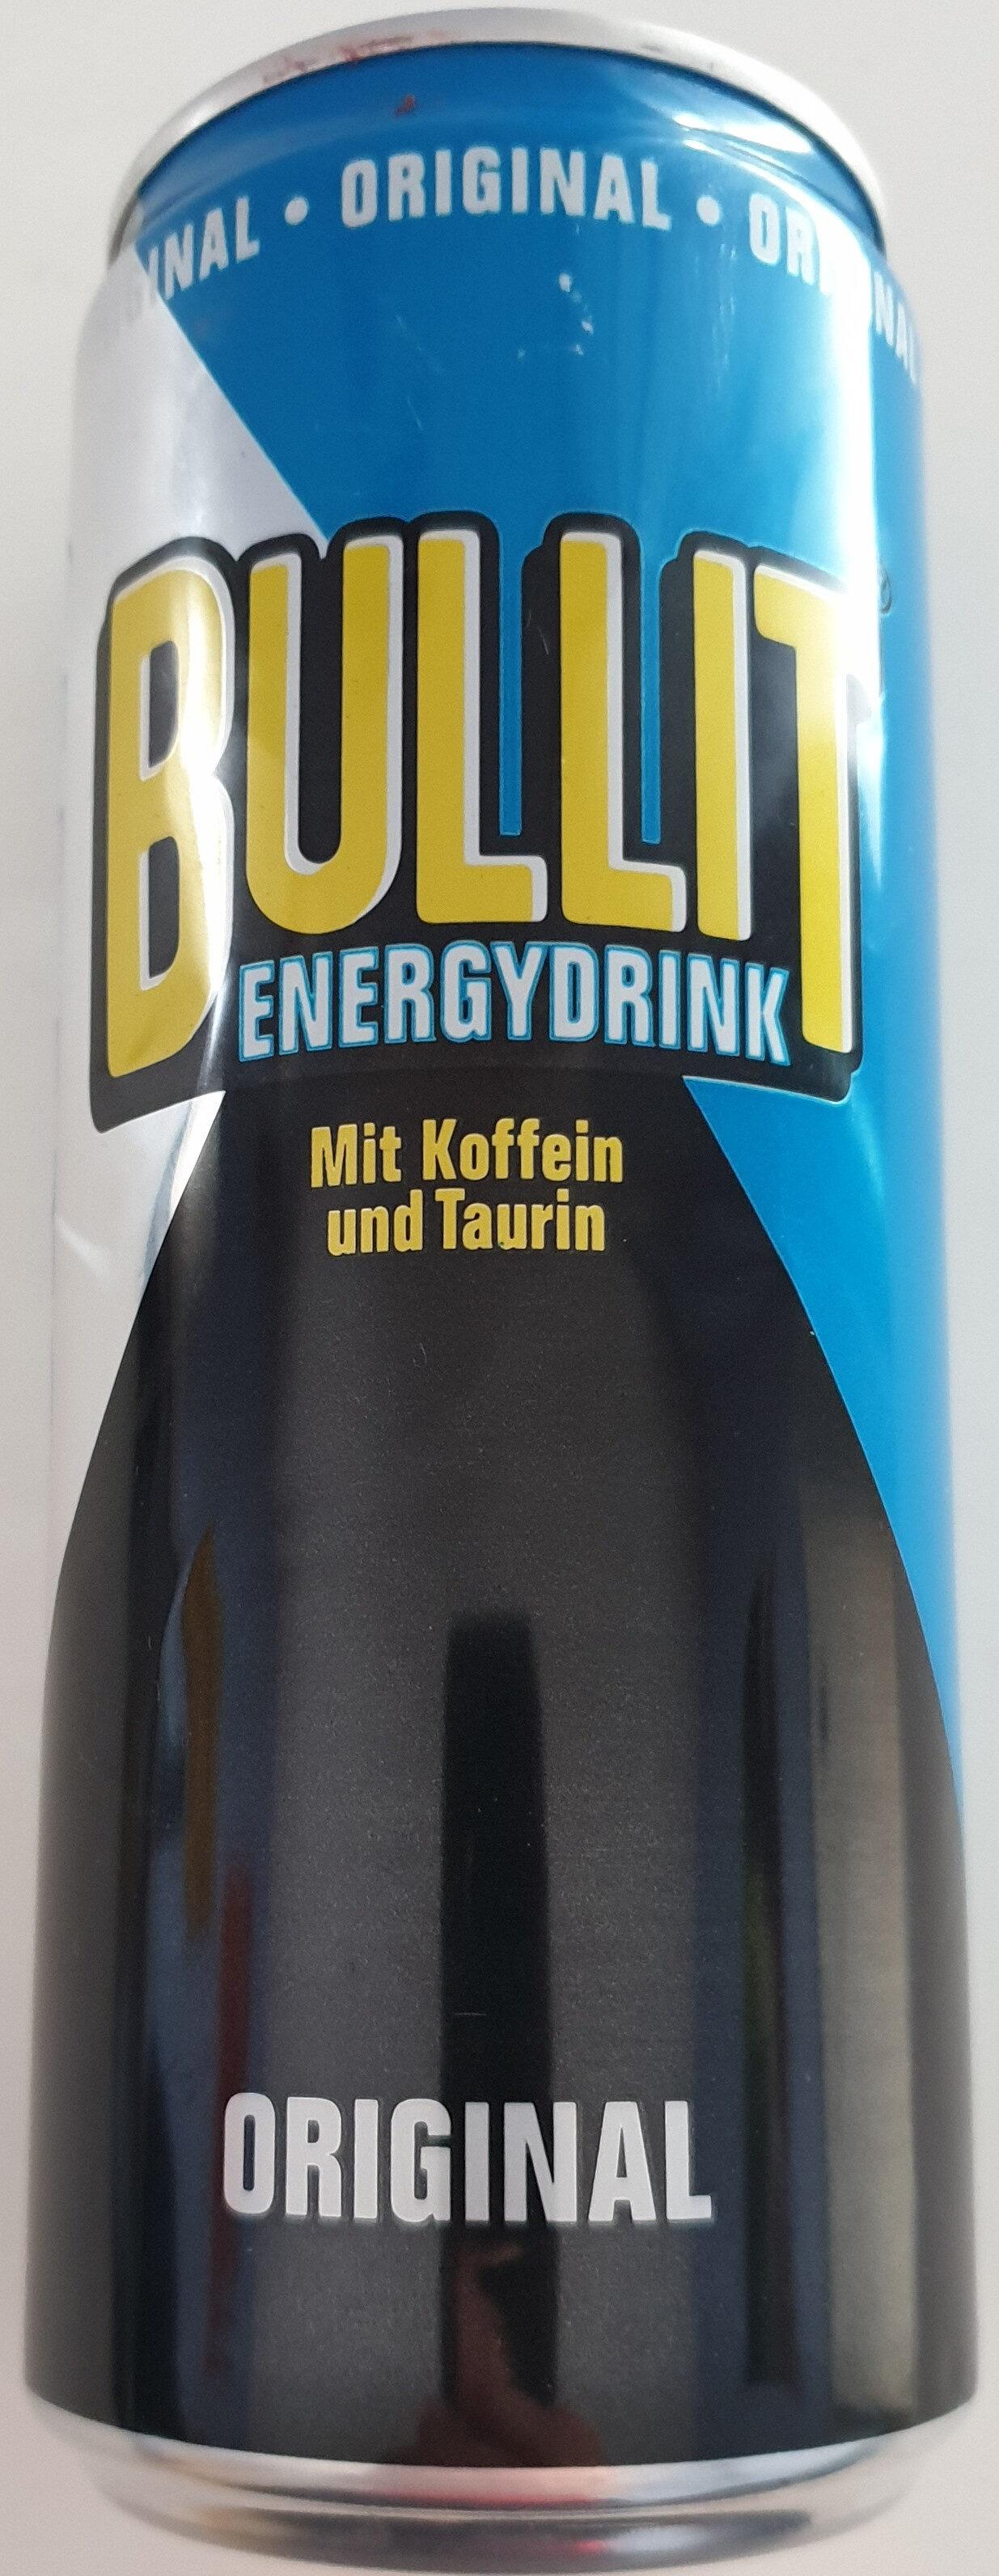 Bullit - Product - de